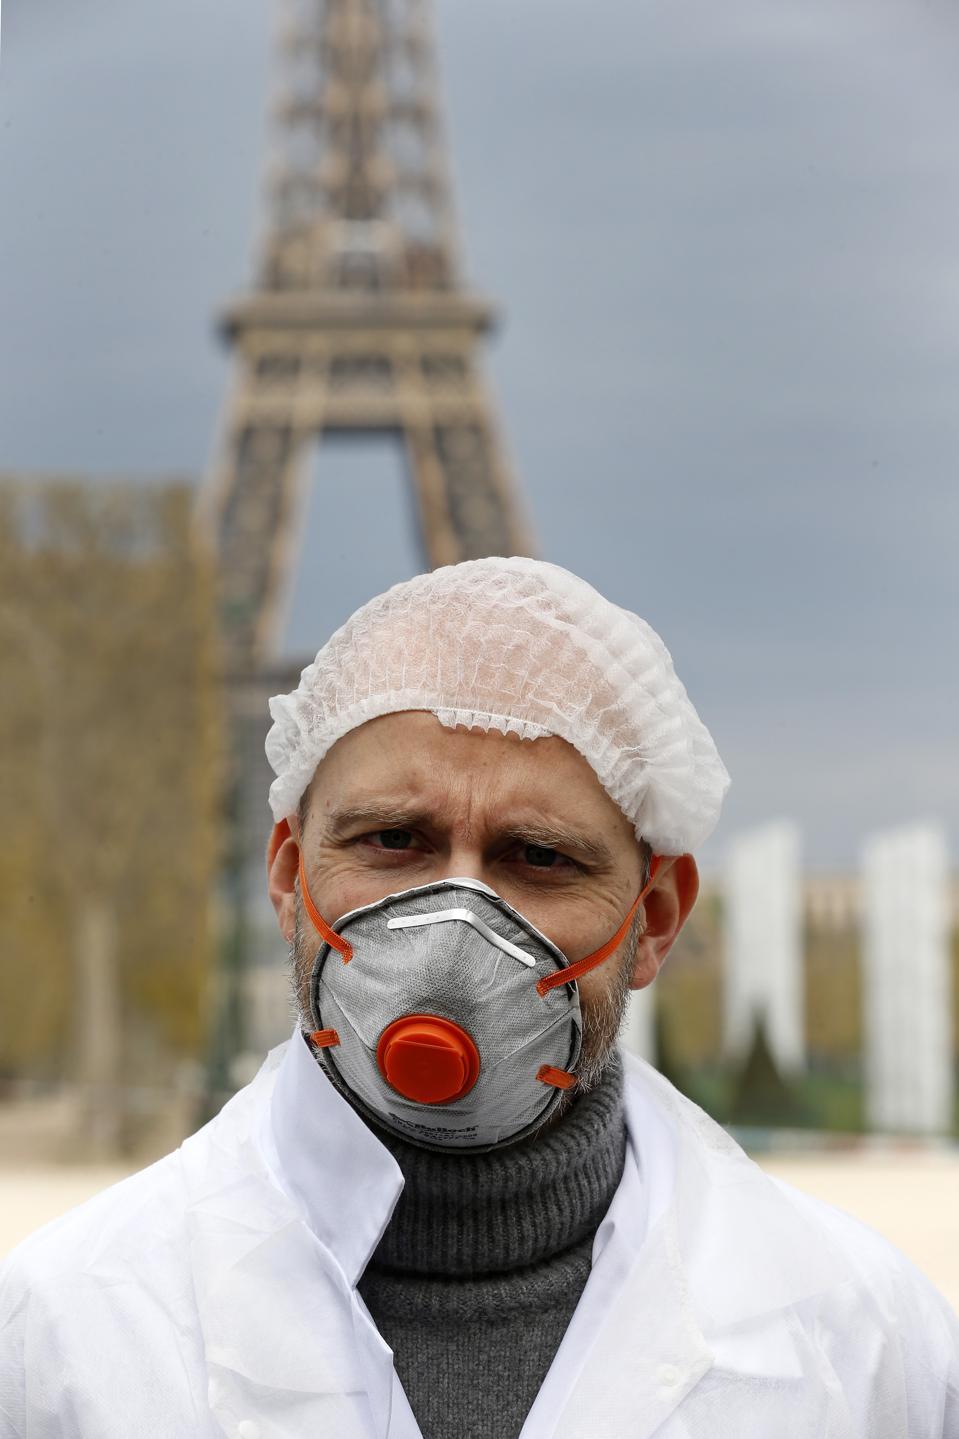 April Will Bring Peak Virus Panic, Analysts Say